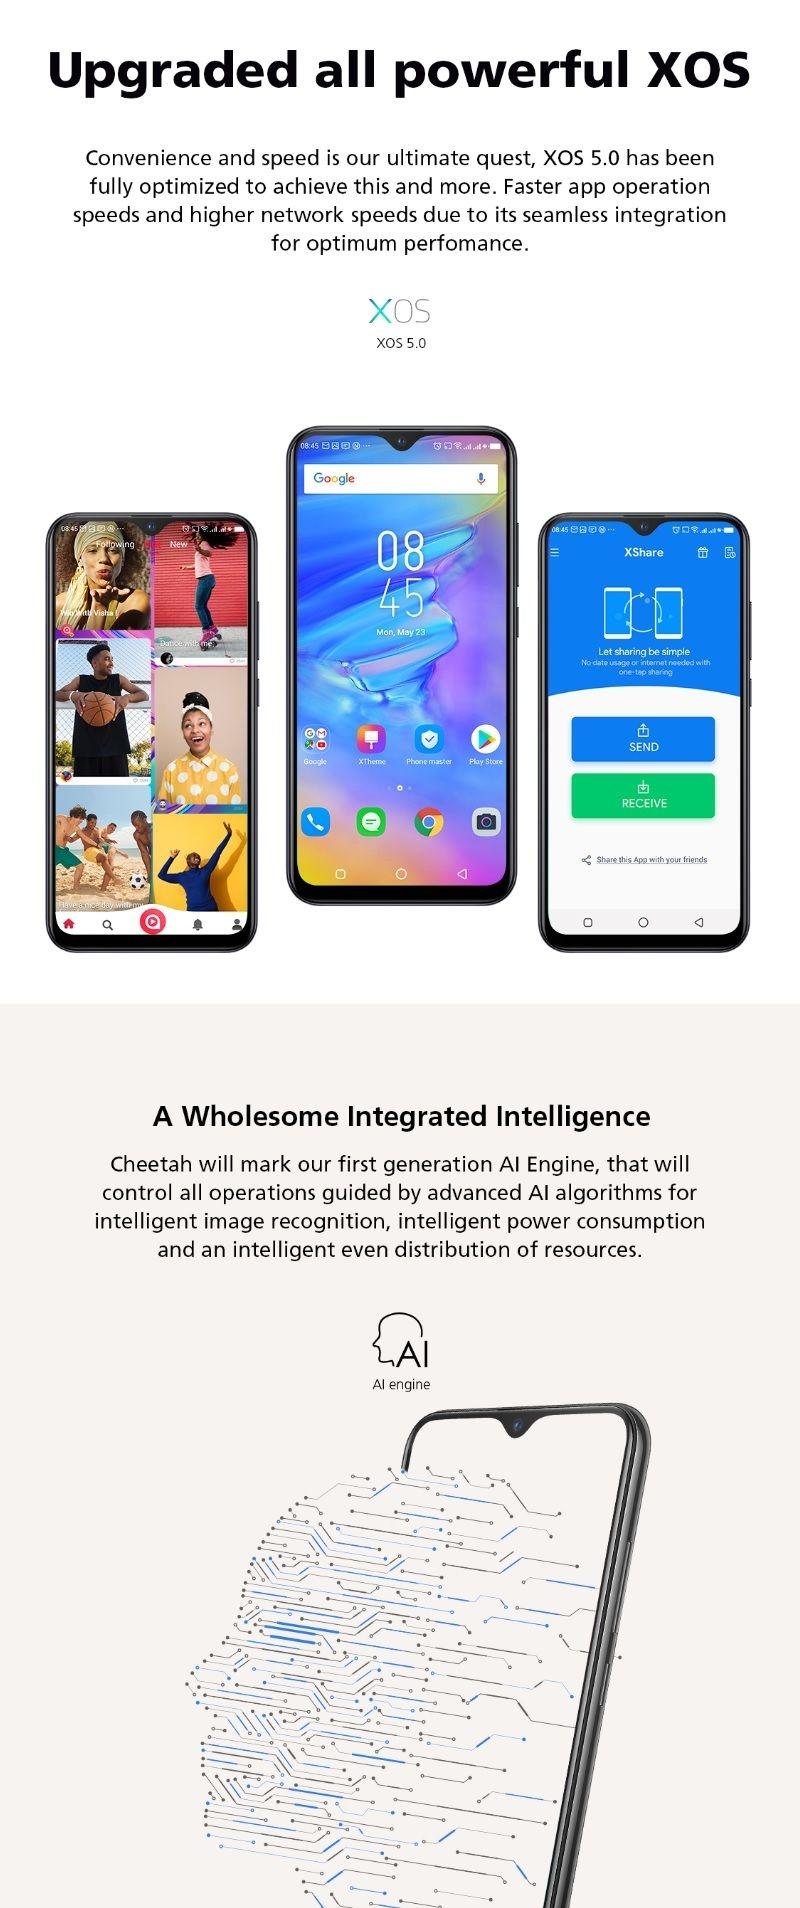 A1 Engine on a smartphone